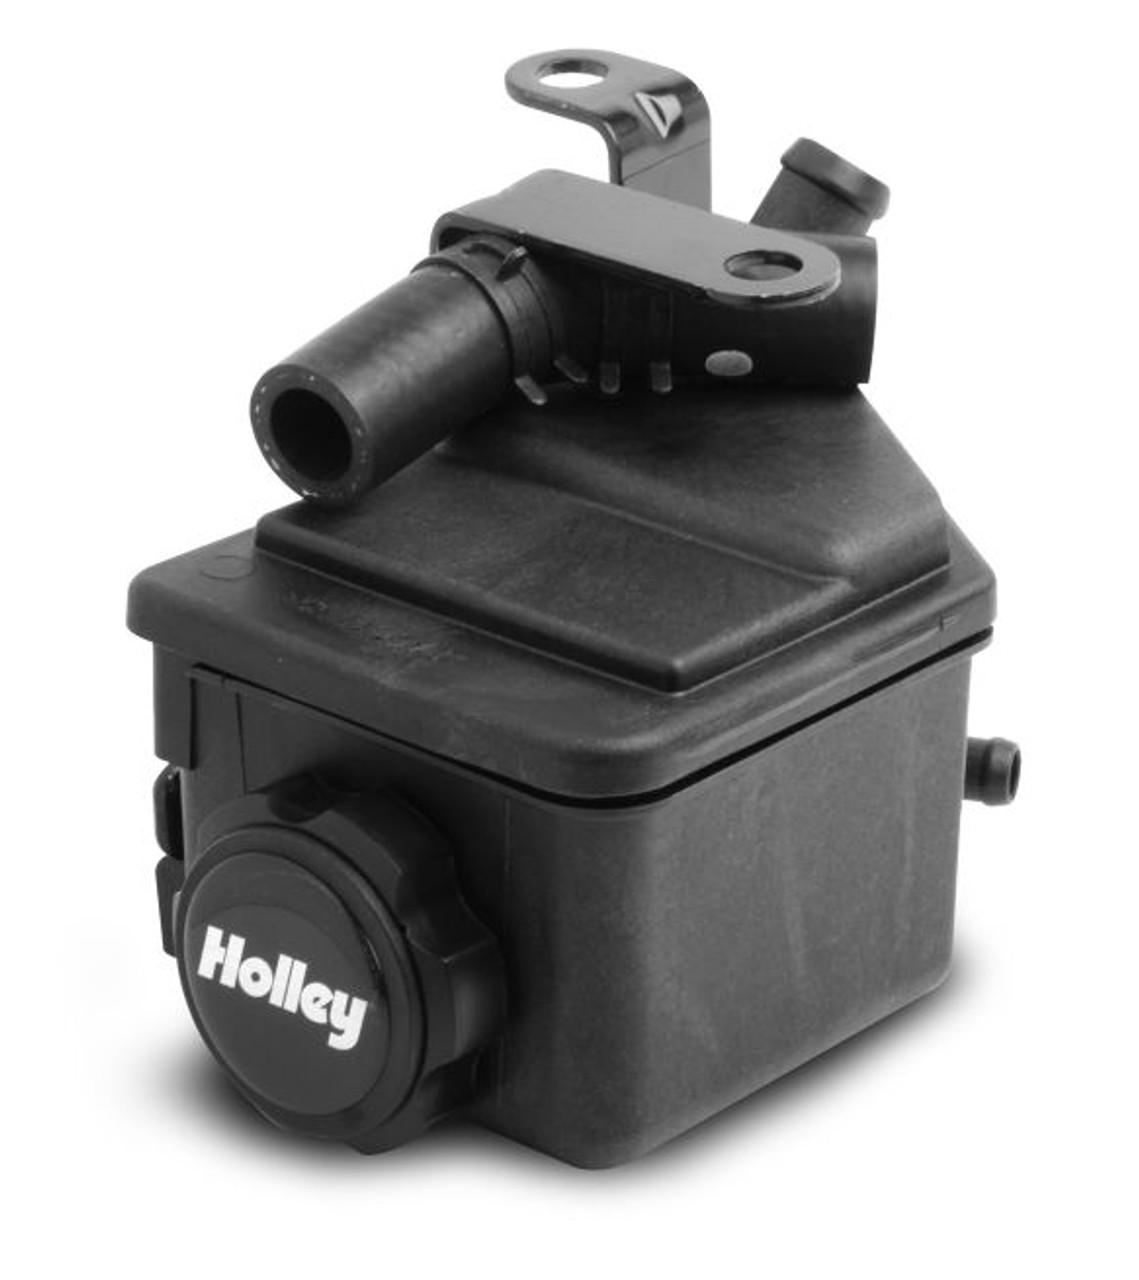 Holley LS Swap Water Pump Forward Facing Inlet Standad Middle Belt Align 22-100